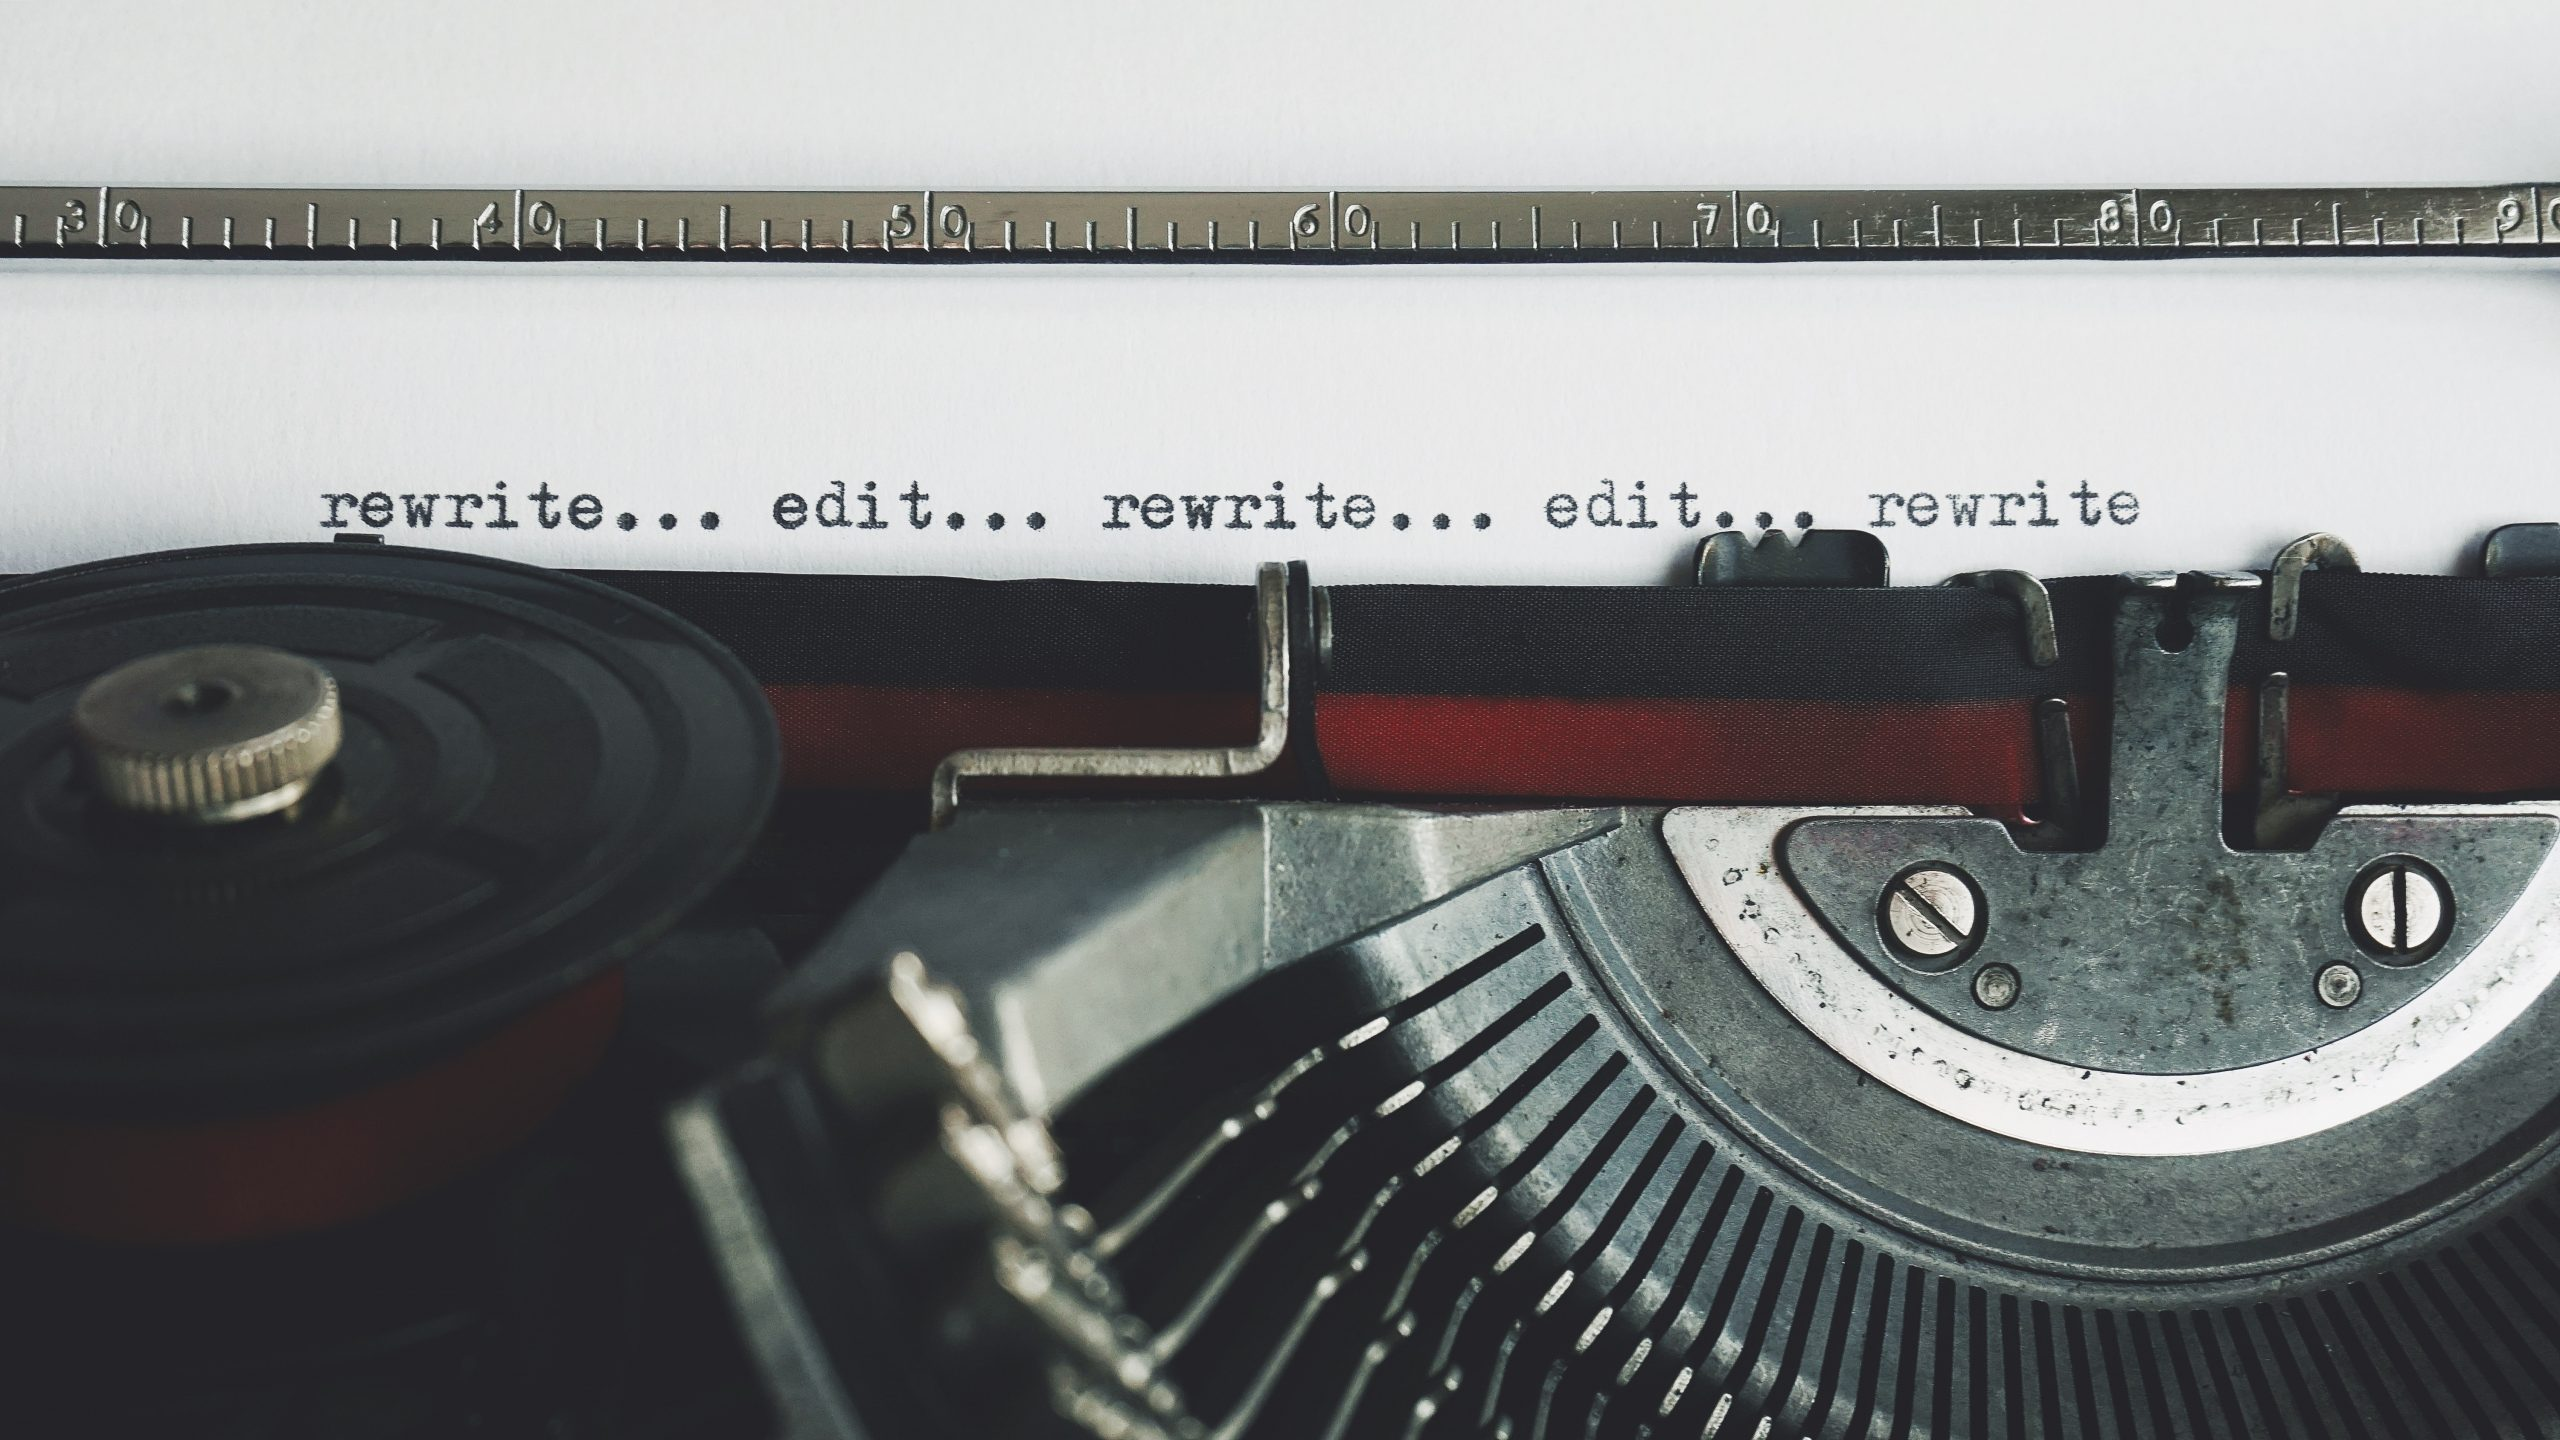 rewrite-edit-text-on-a-typewriter-3631711